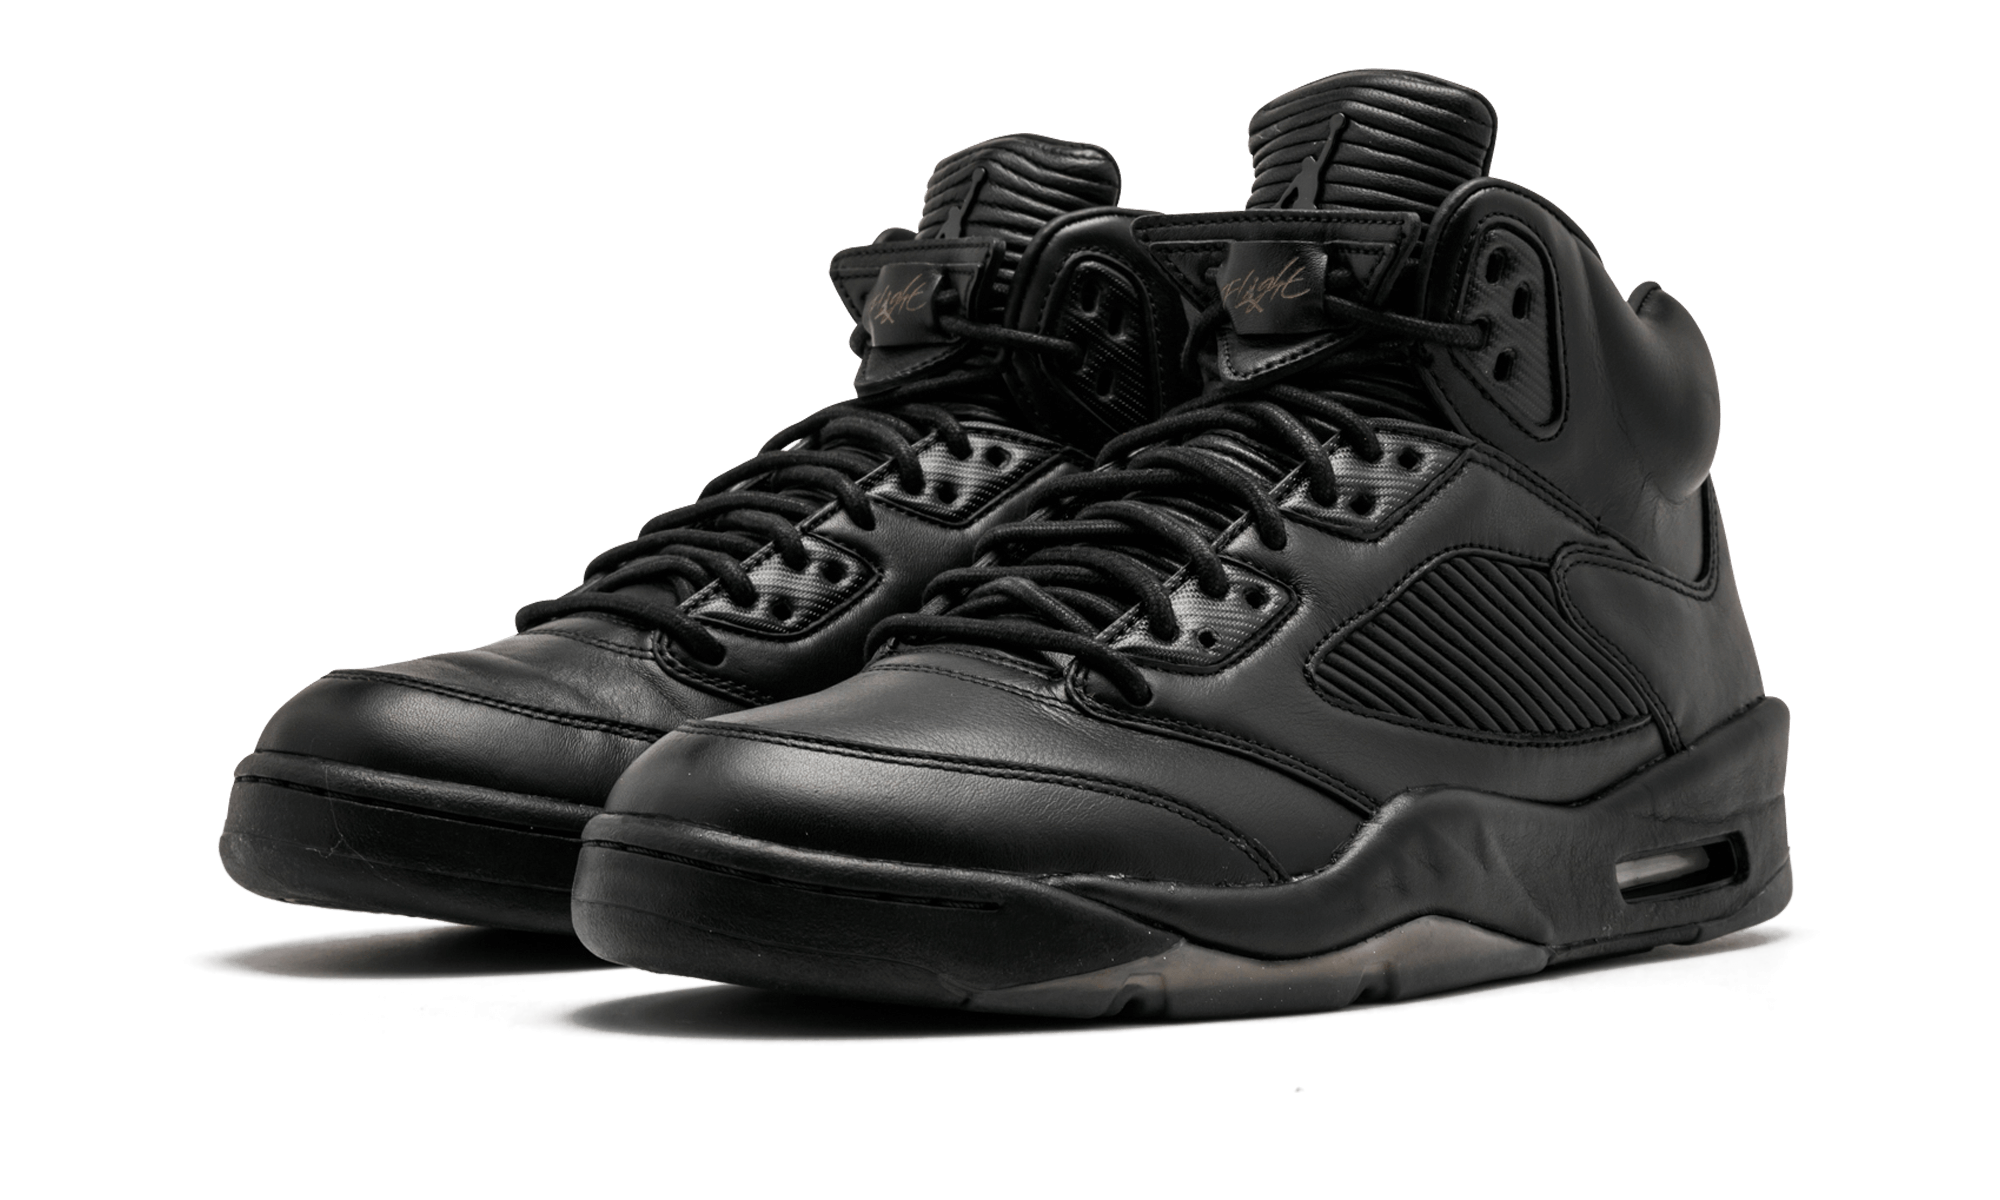 28630e819f9 Air Jordan 5 Retro Premium Black Leather Sneakers